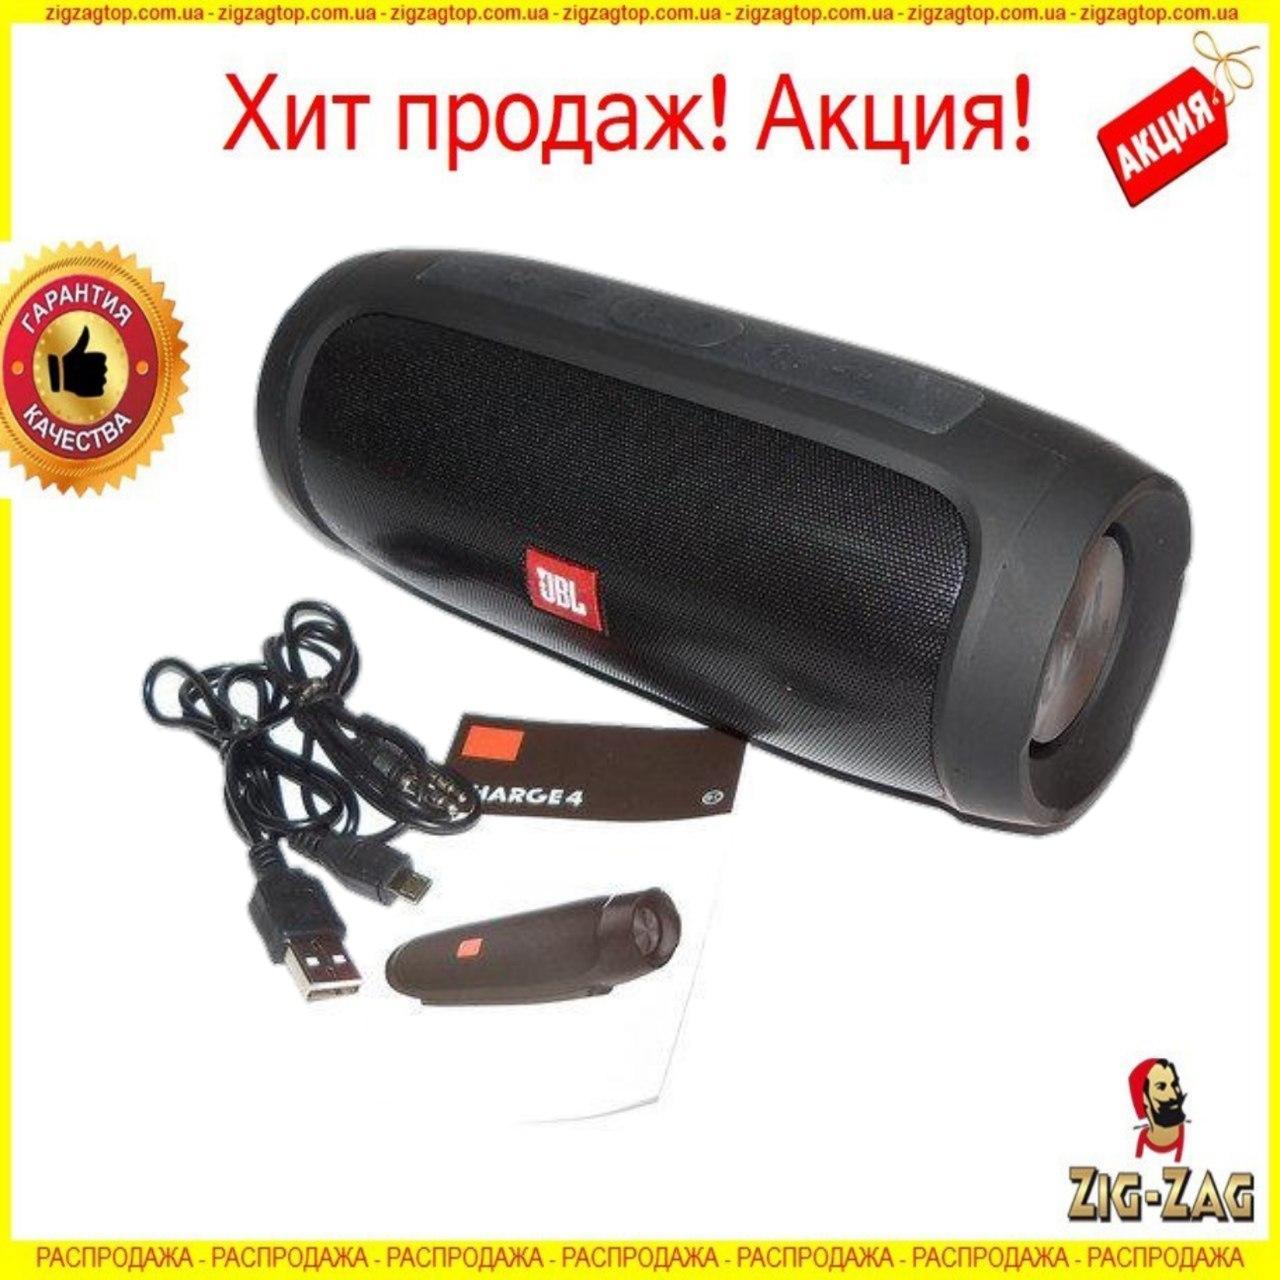 Портативная колонка JBL Charge 4 Большая! блютуз Bluetooth Джбл микрофон PowerBank  акустика SD, USB ,FM, AUX